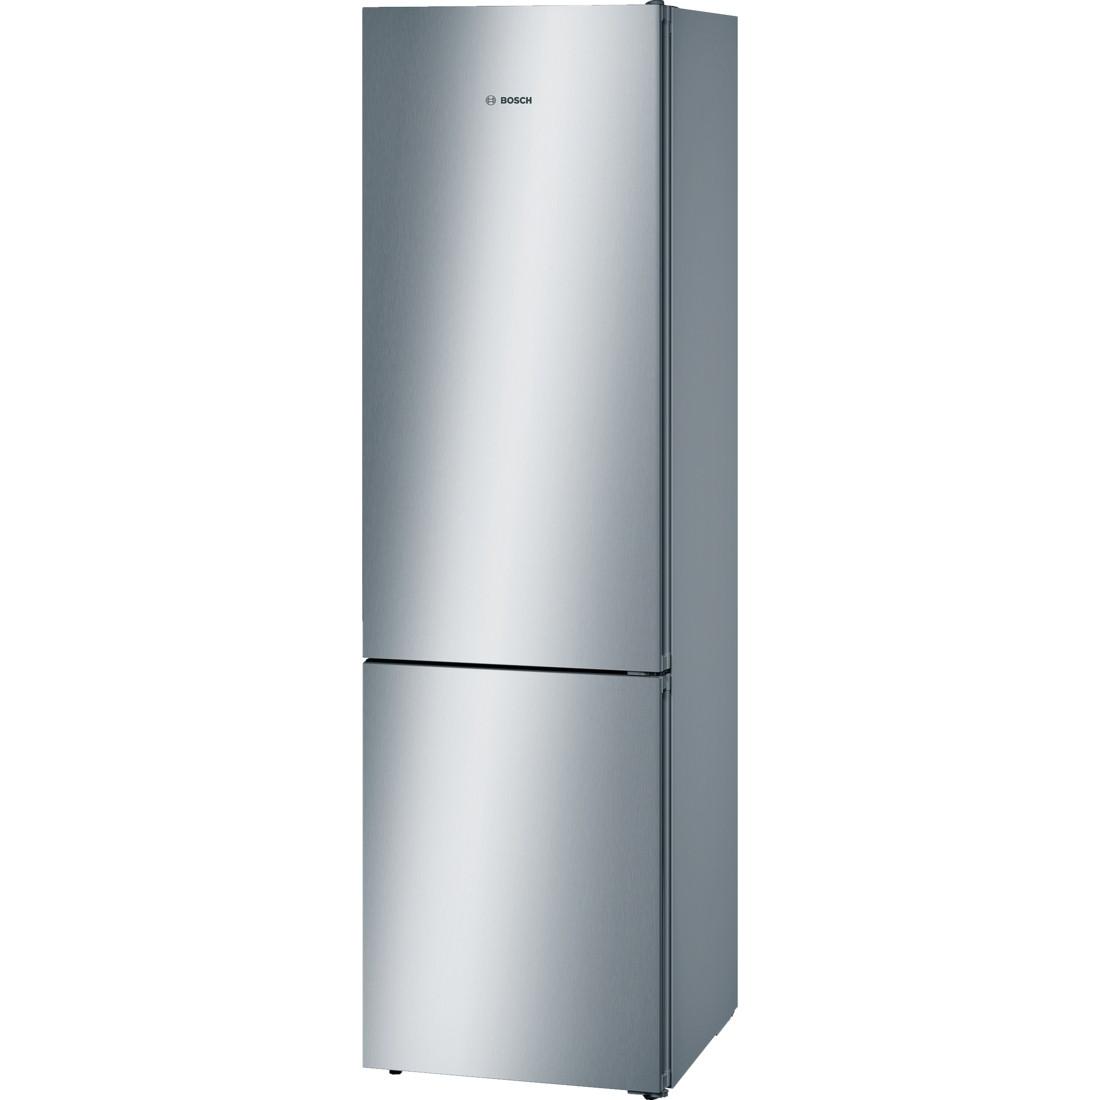 Двухкамерный холодильник Bosch KGN39KL35